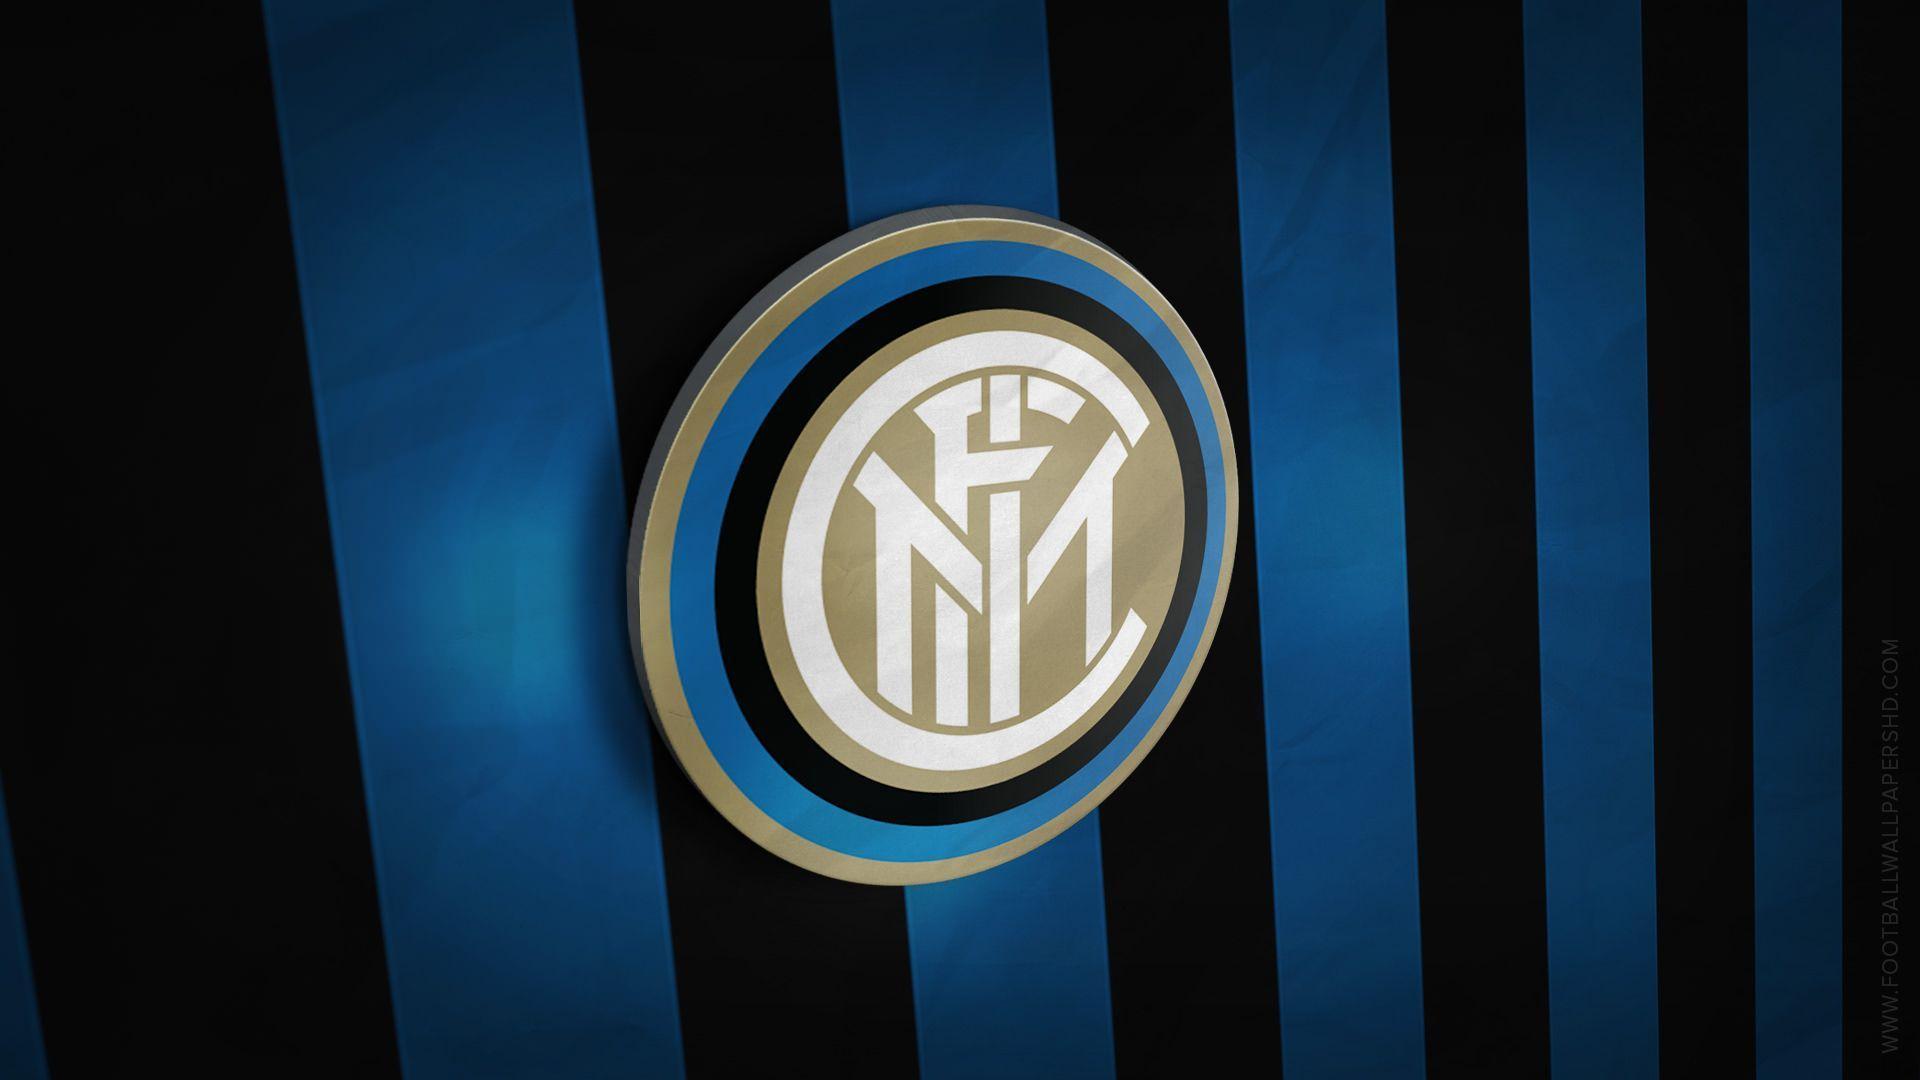 Inter Milan 2018 Wallpapers - Wallpaper Cave